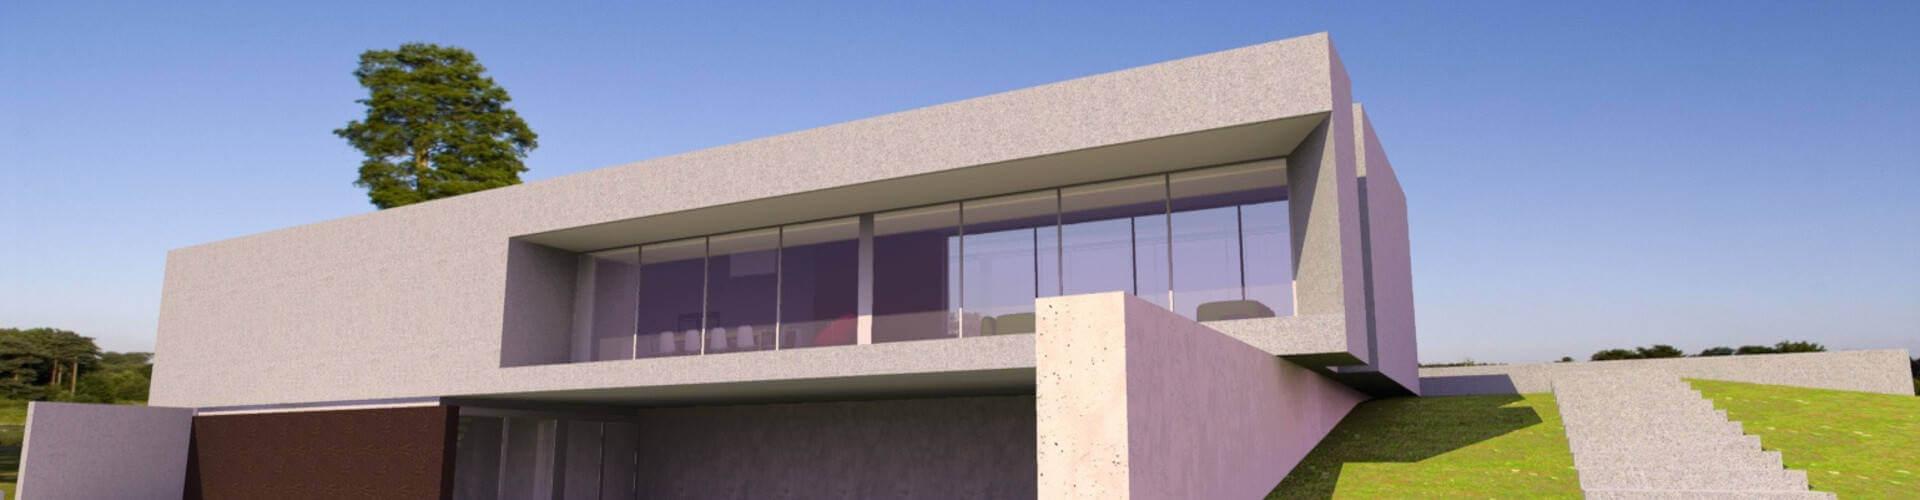 3d_house_rendering